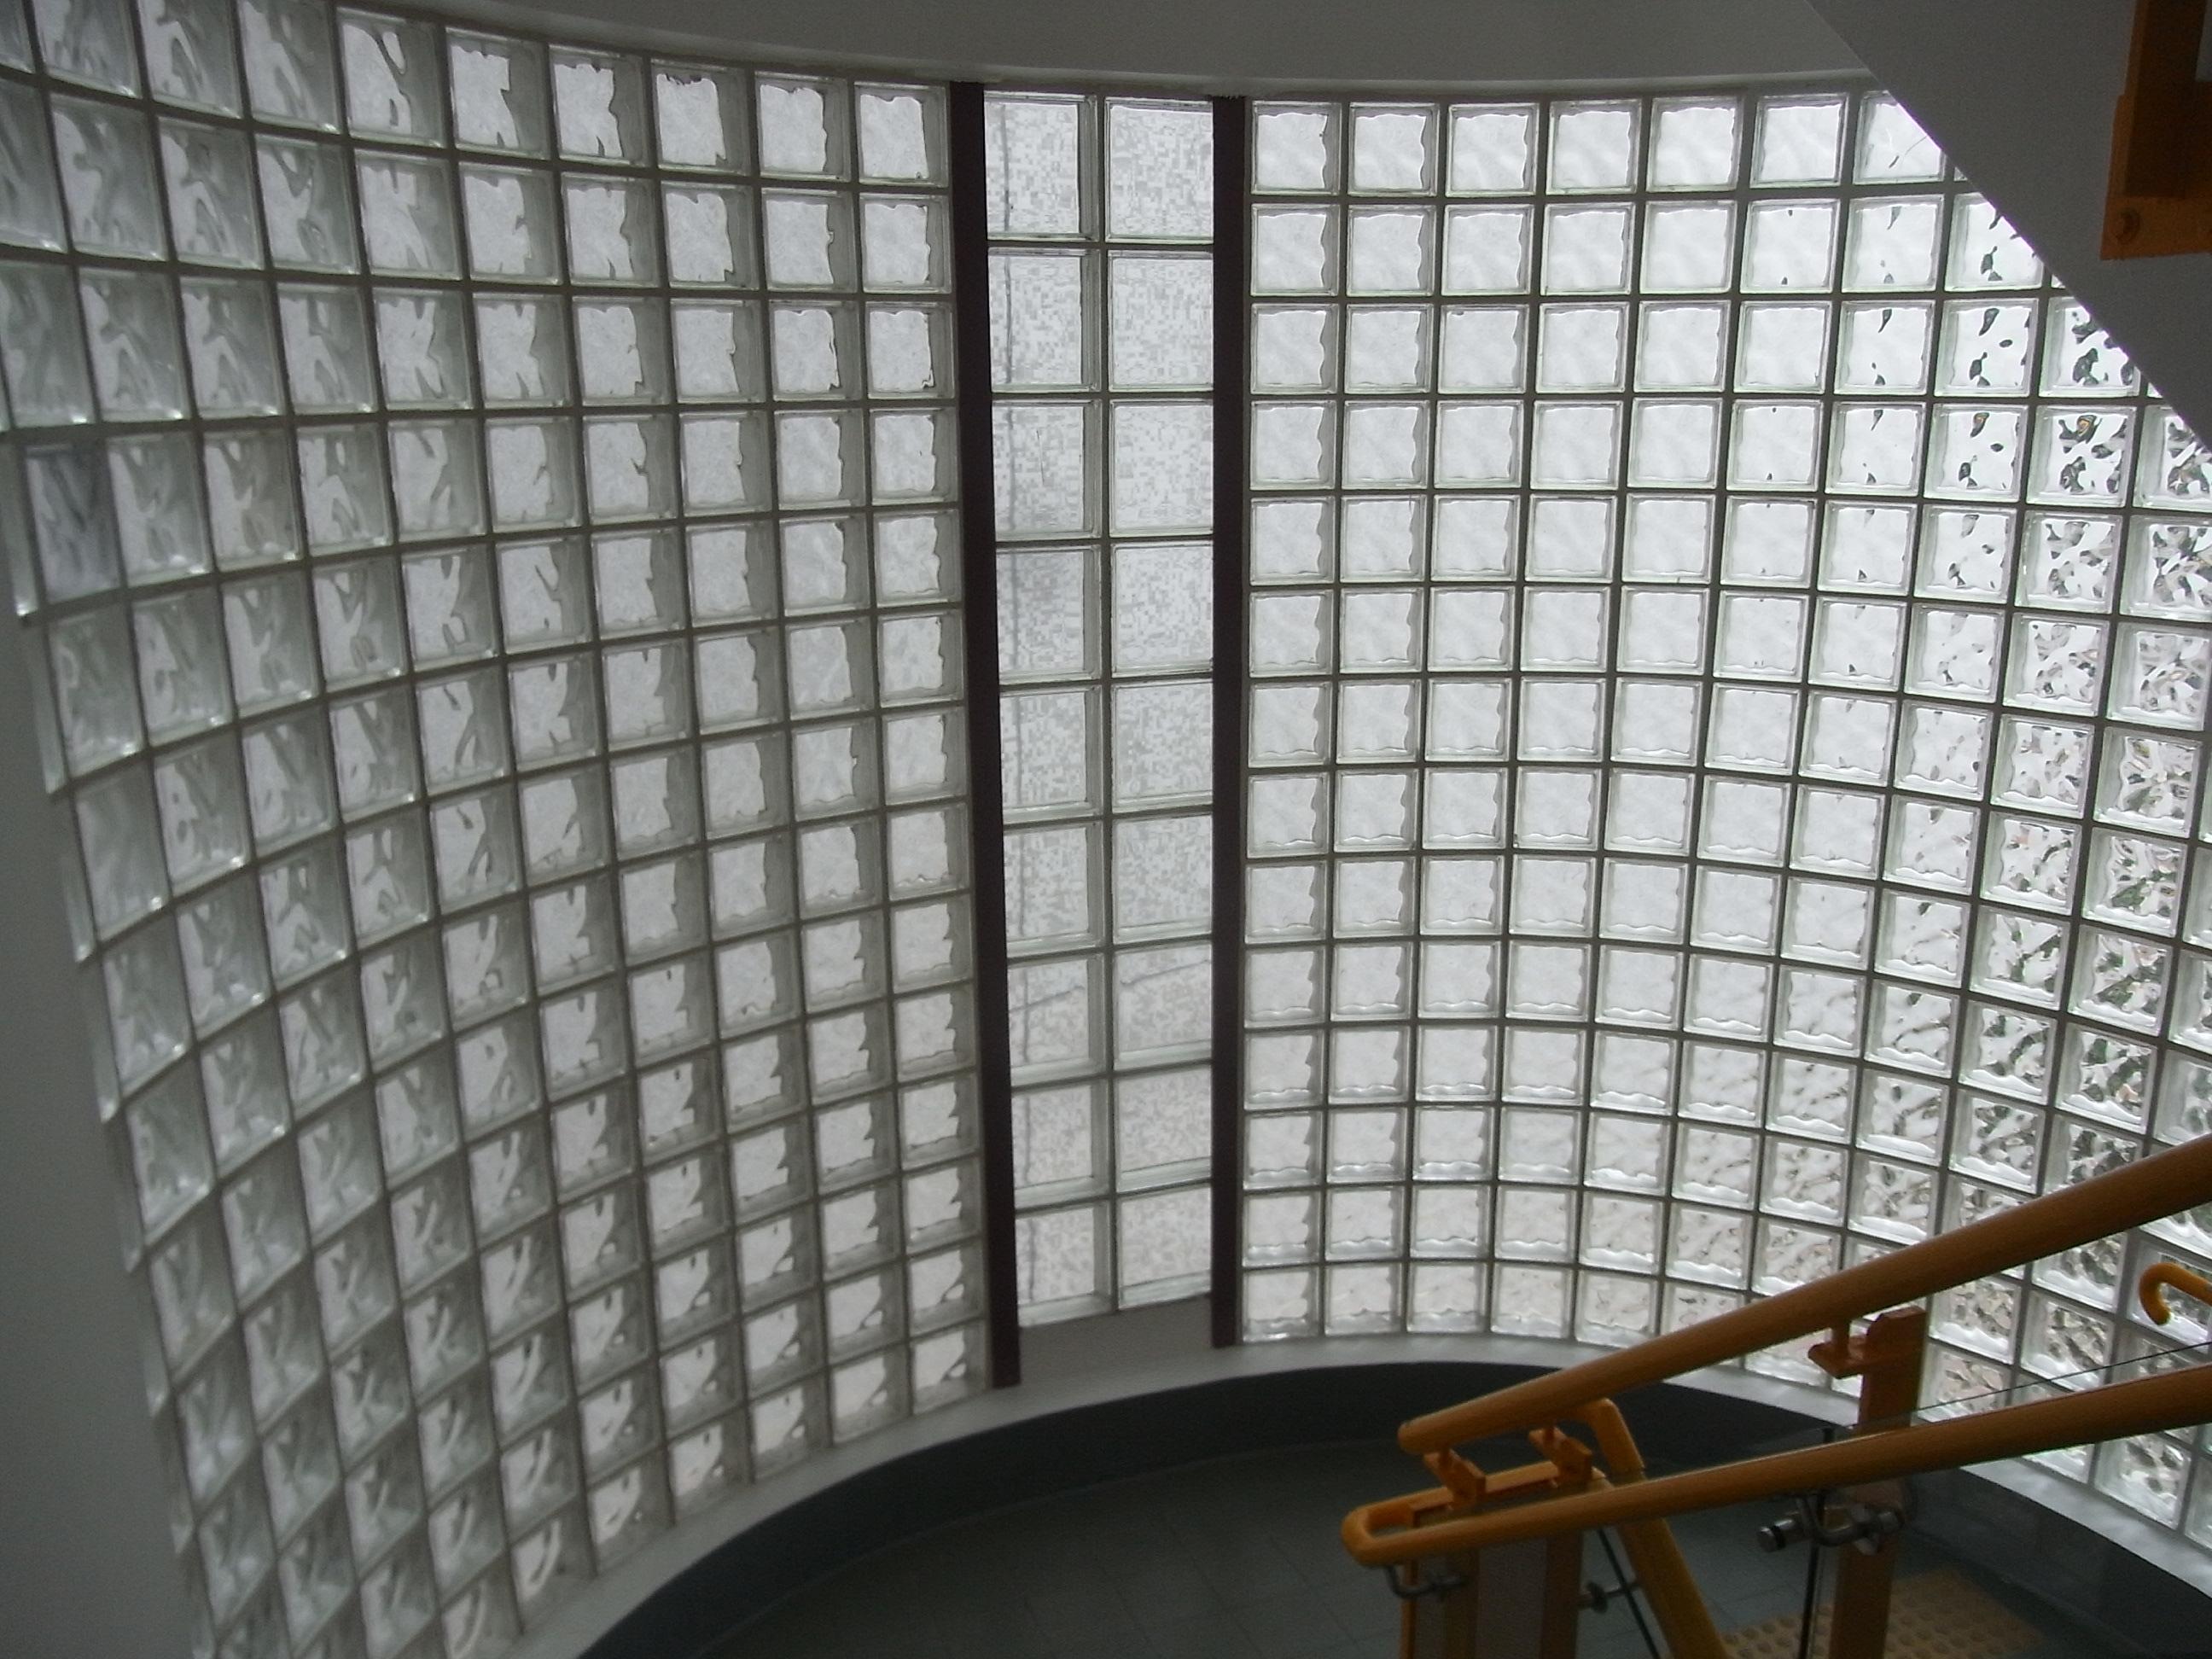 Glass Mosaic Tiles At Home Depot